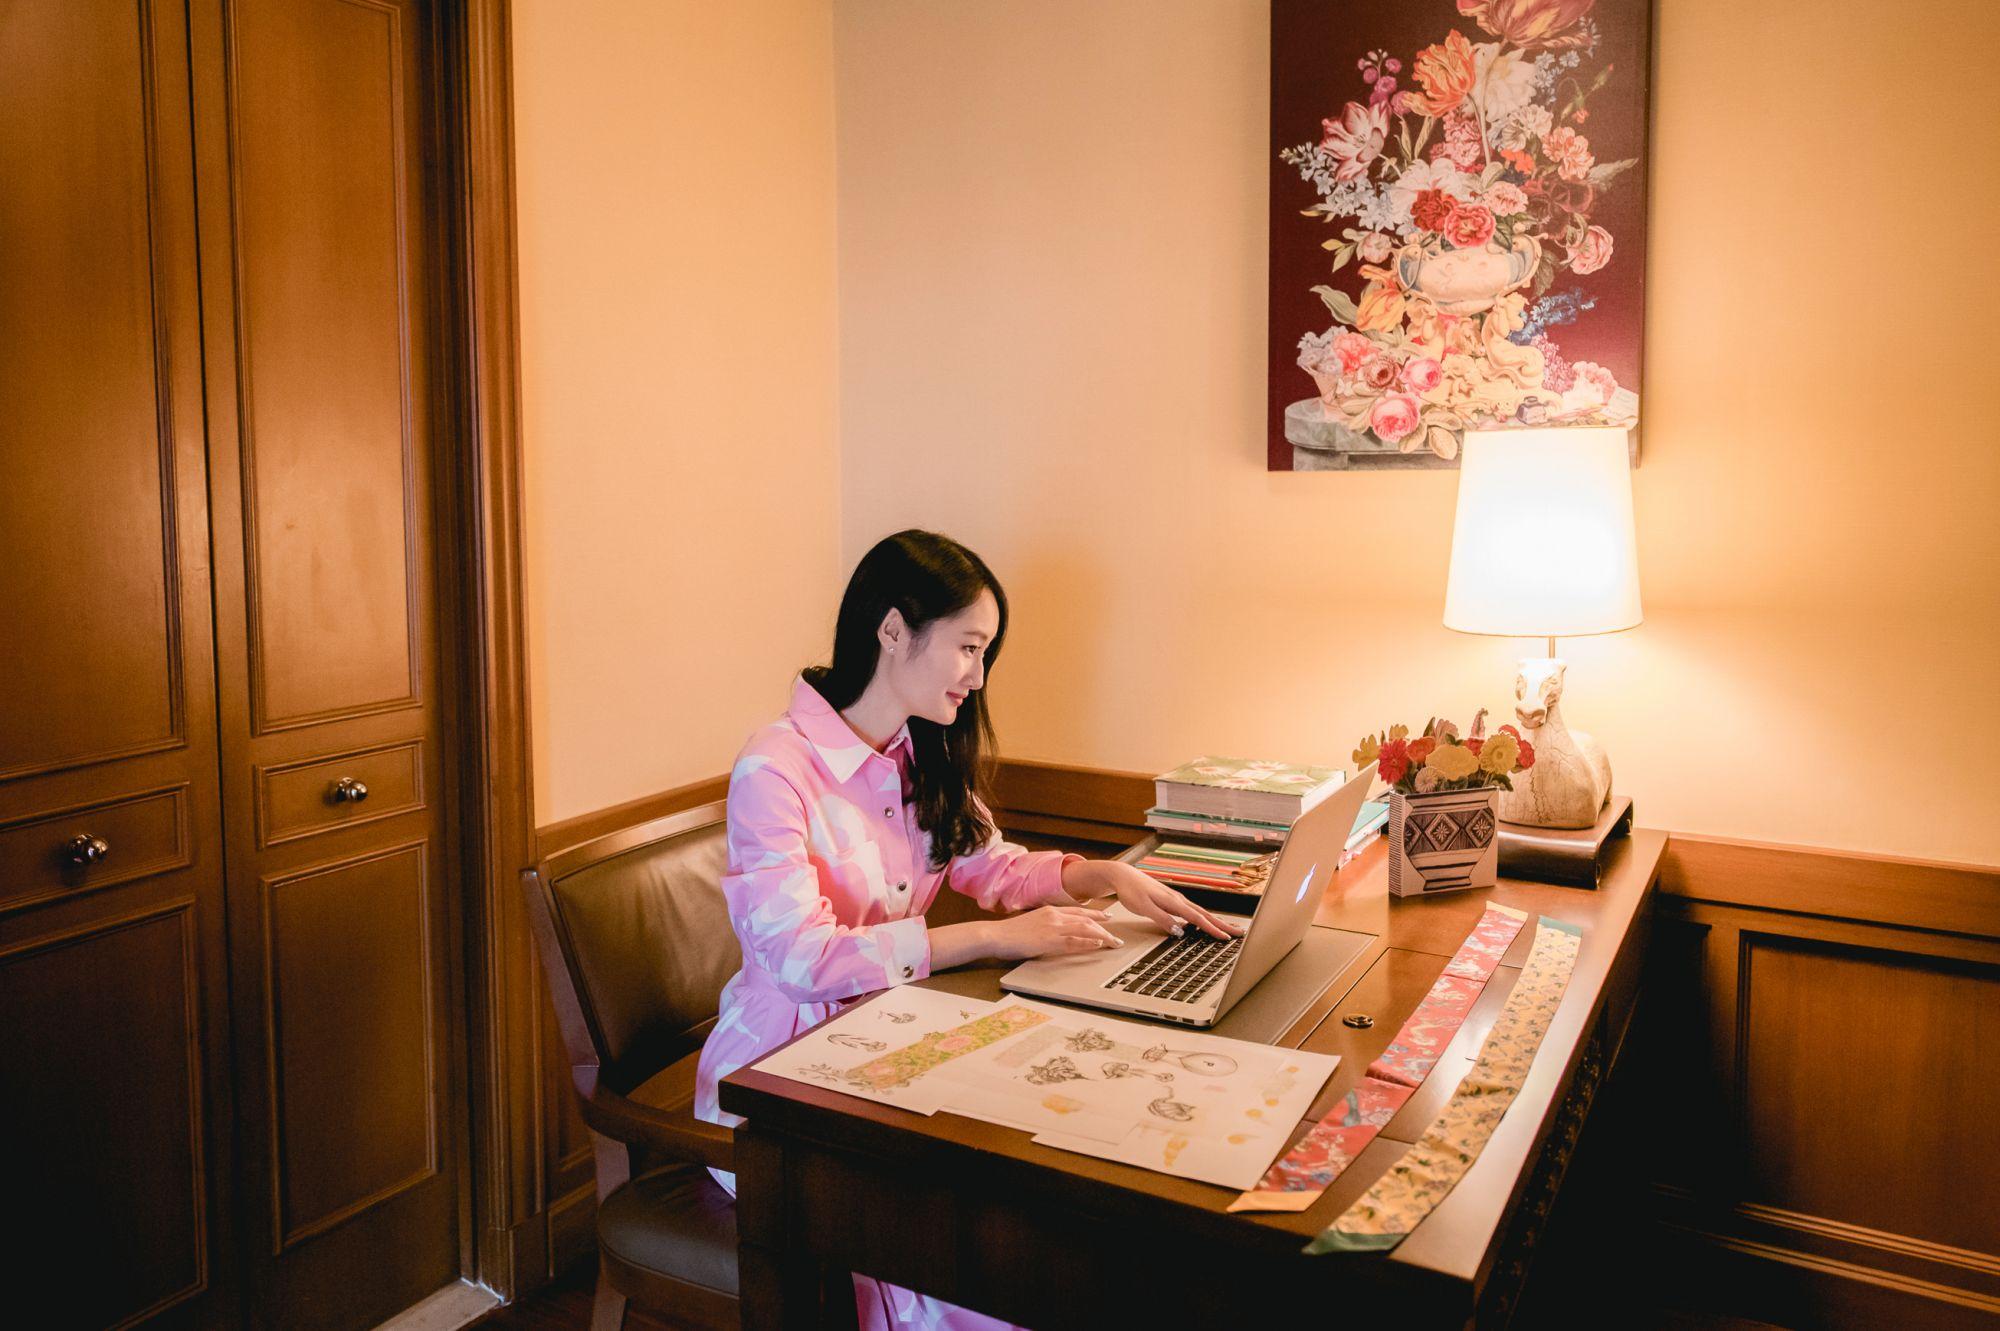 Artist Pichaya Osothcharoenpol On Bringing Thai Heritage Back To Life